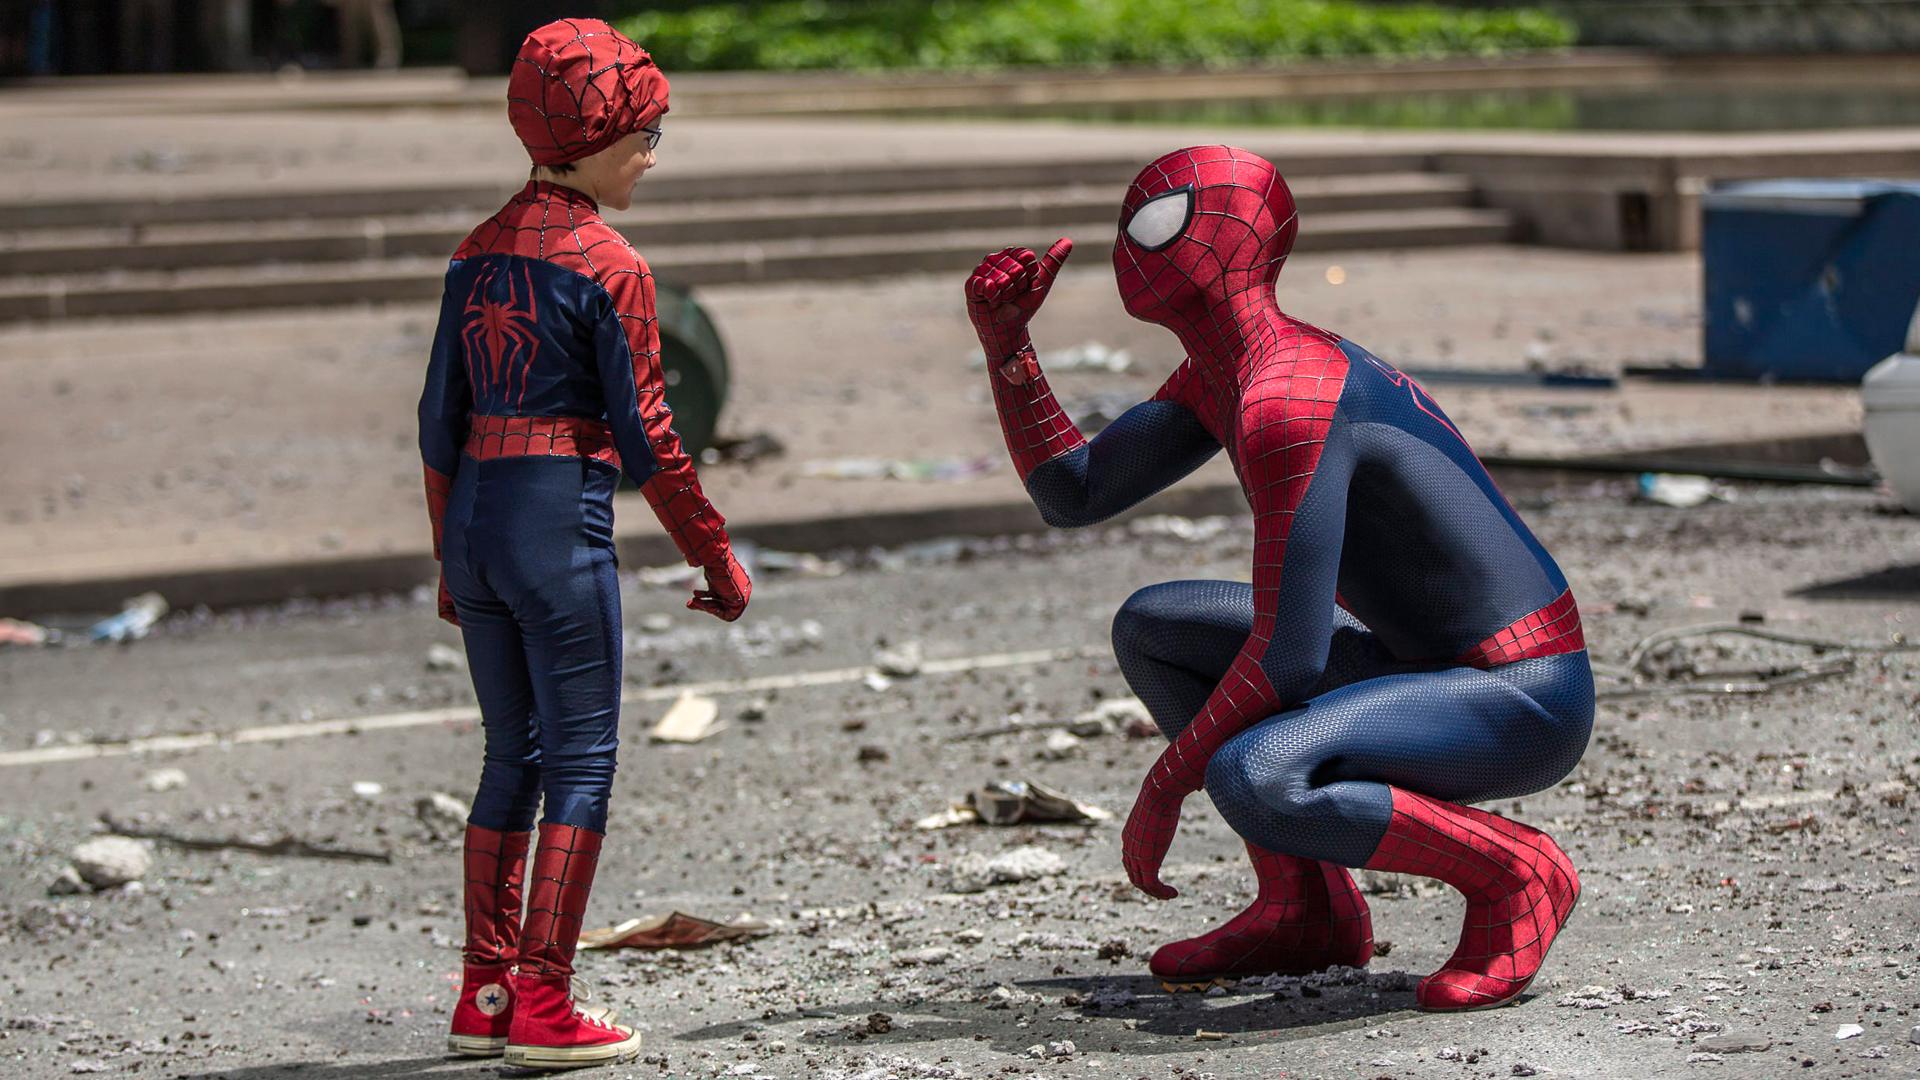 amazing spider-man 2 movie 2b wallpaper hd